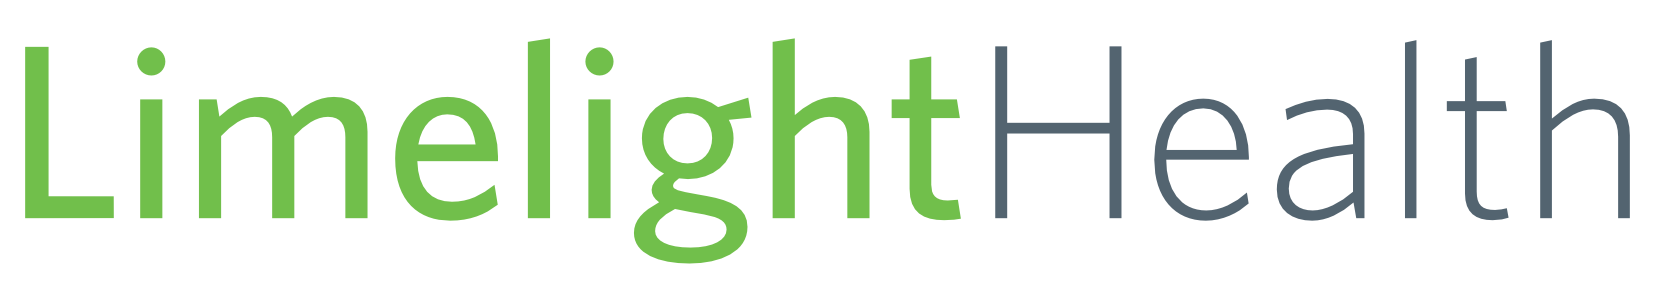 limelighthealth logo